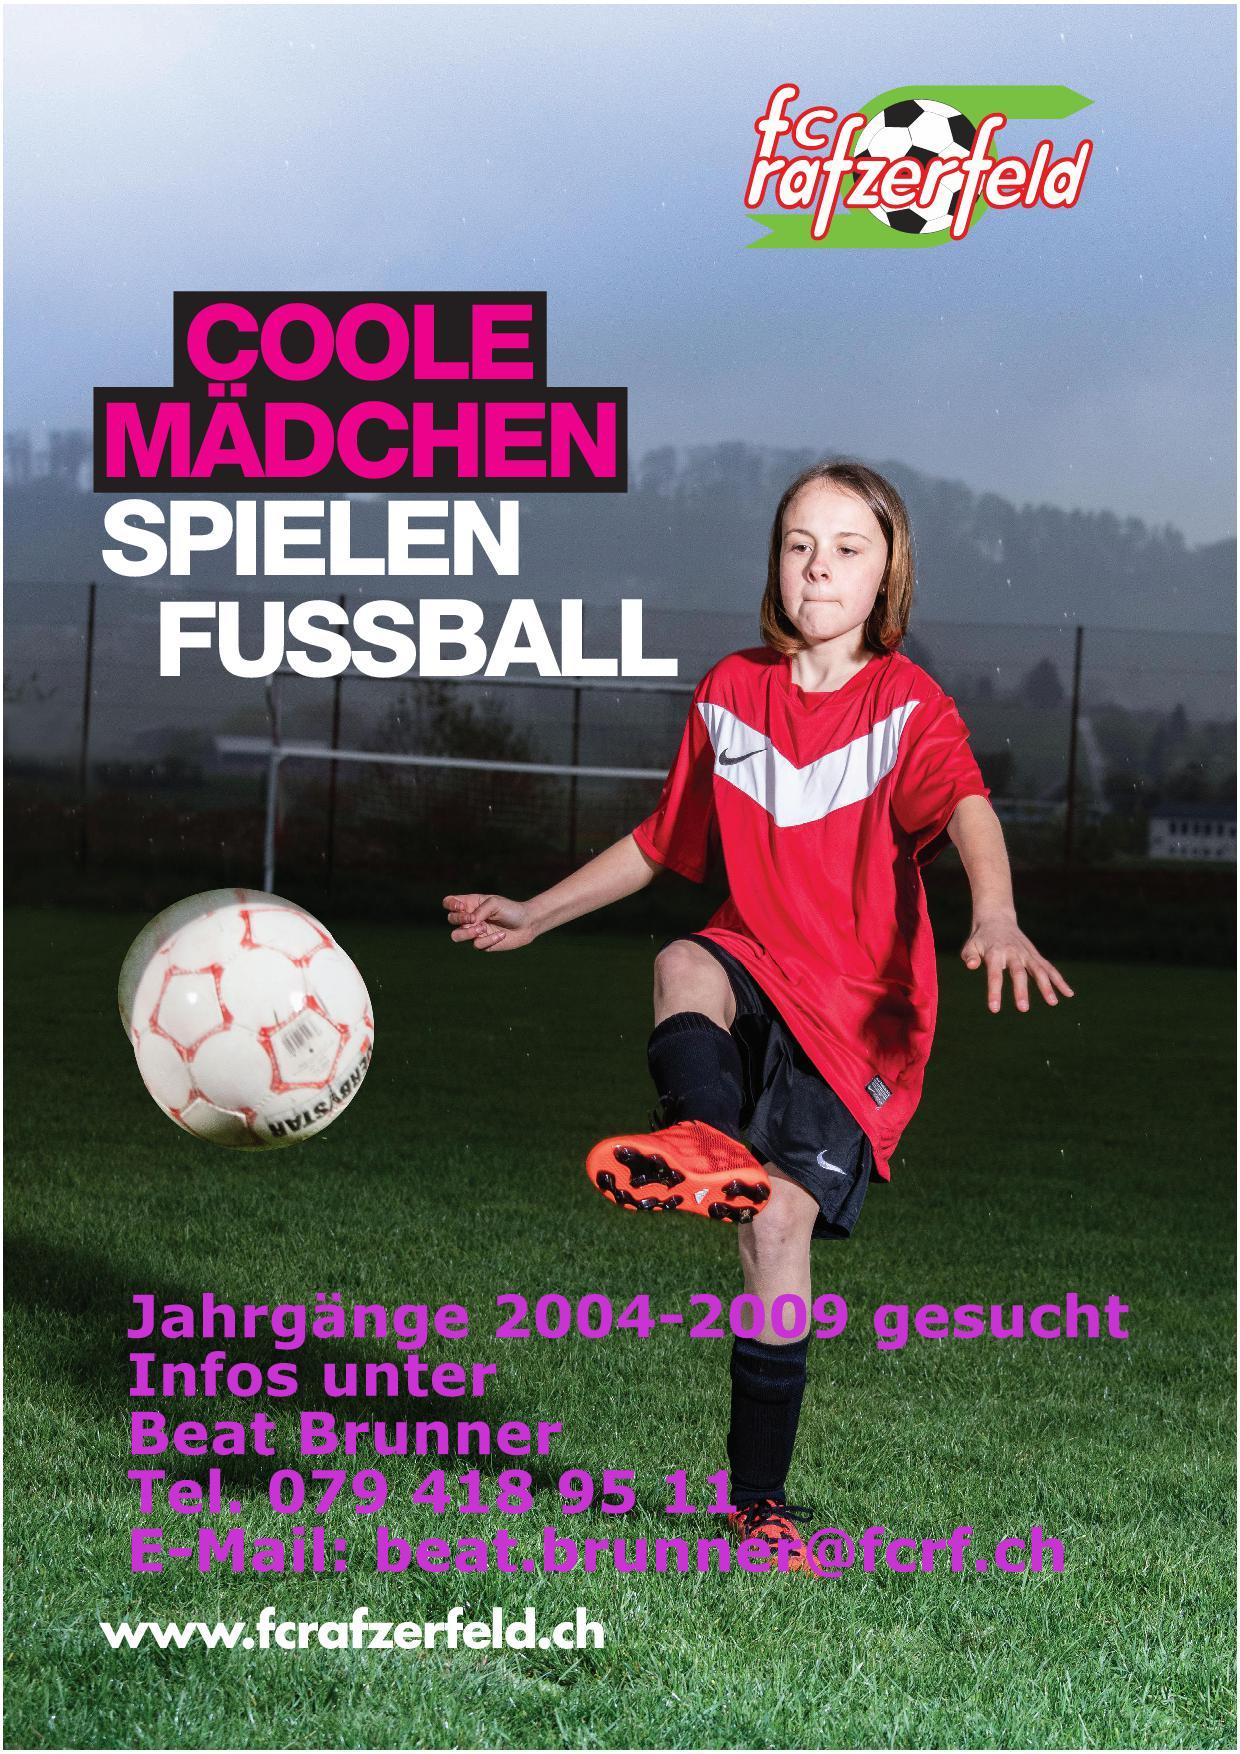 Coole Fussball Spiele